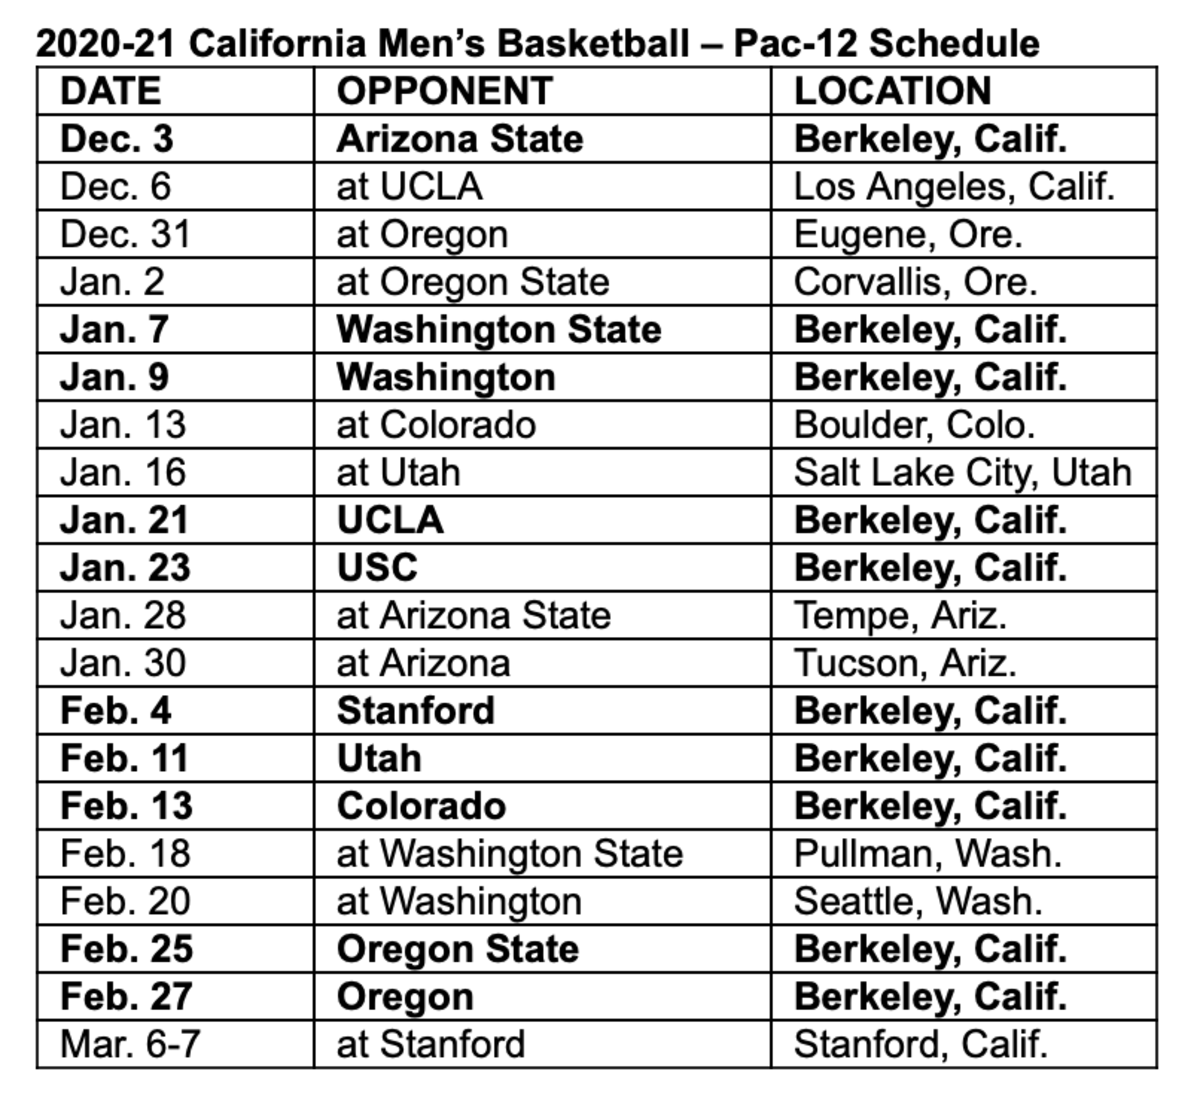 Cal 2020-21 Pac-12 basketball schedule